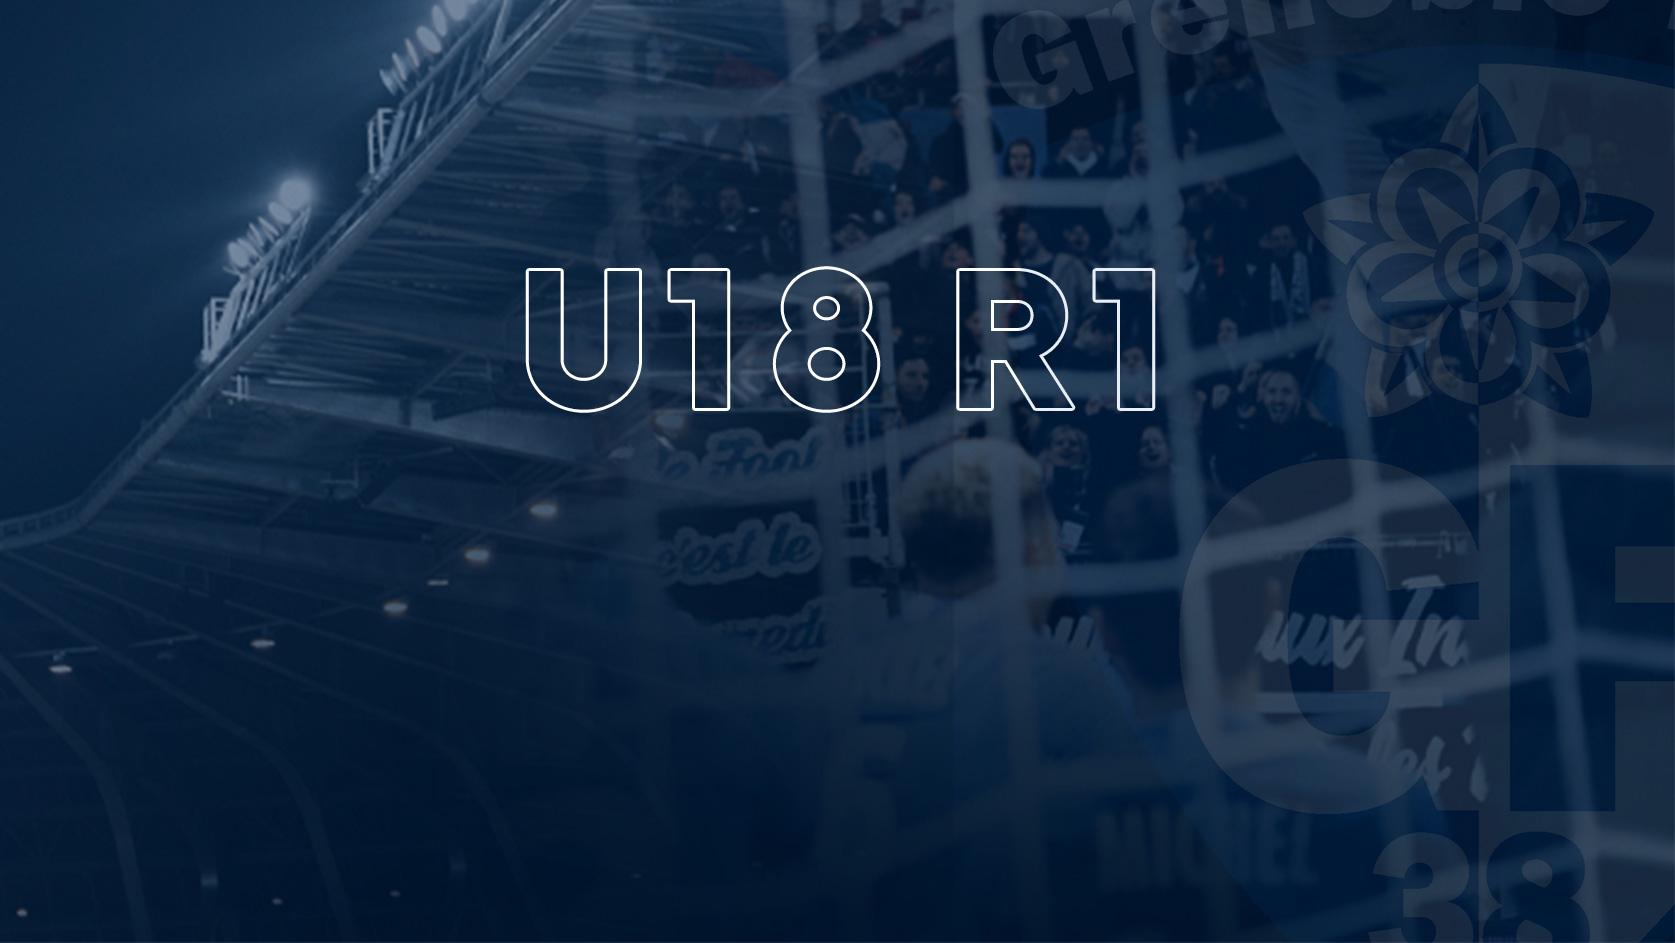 U18 R1